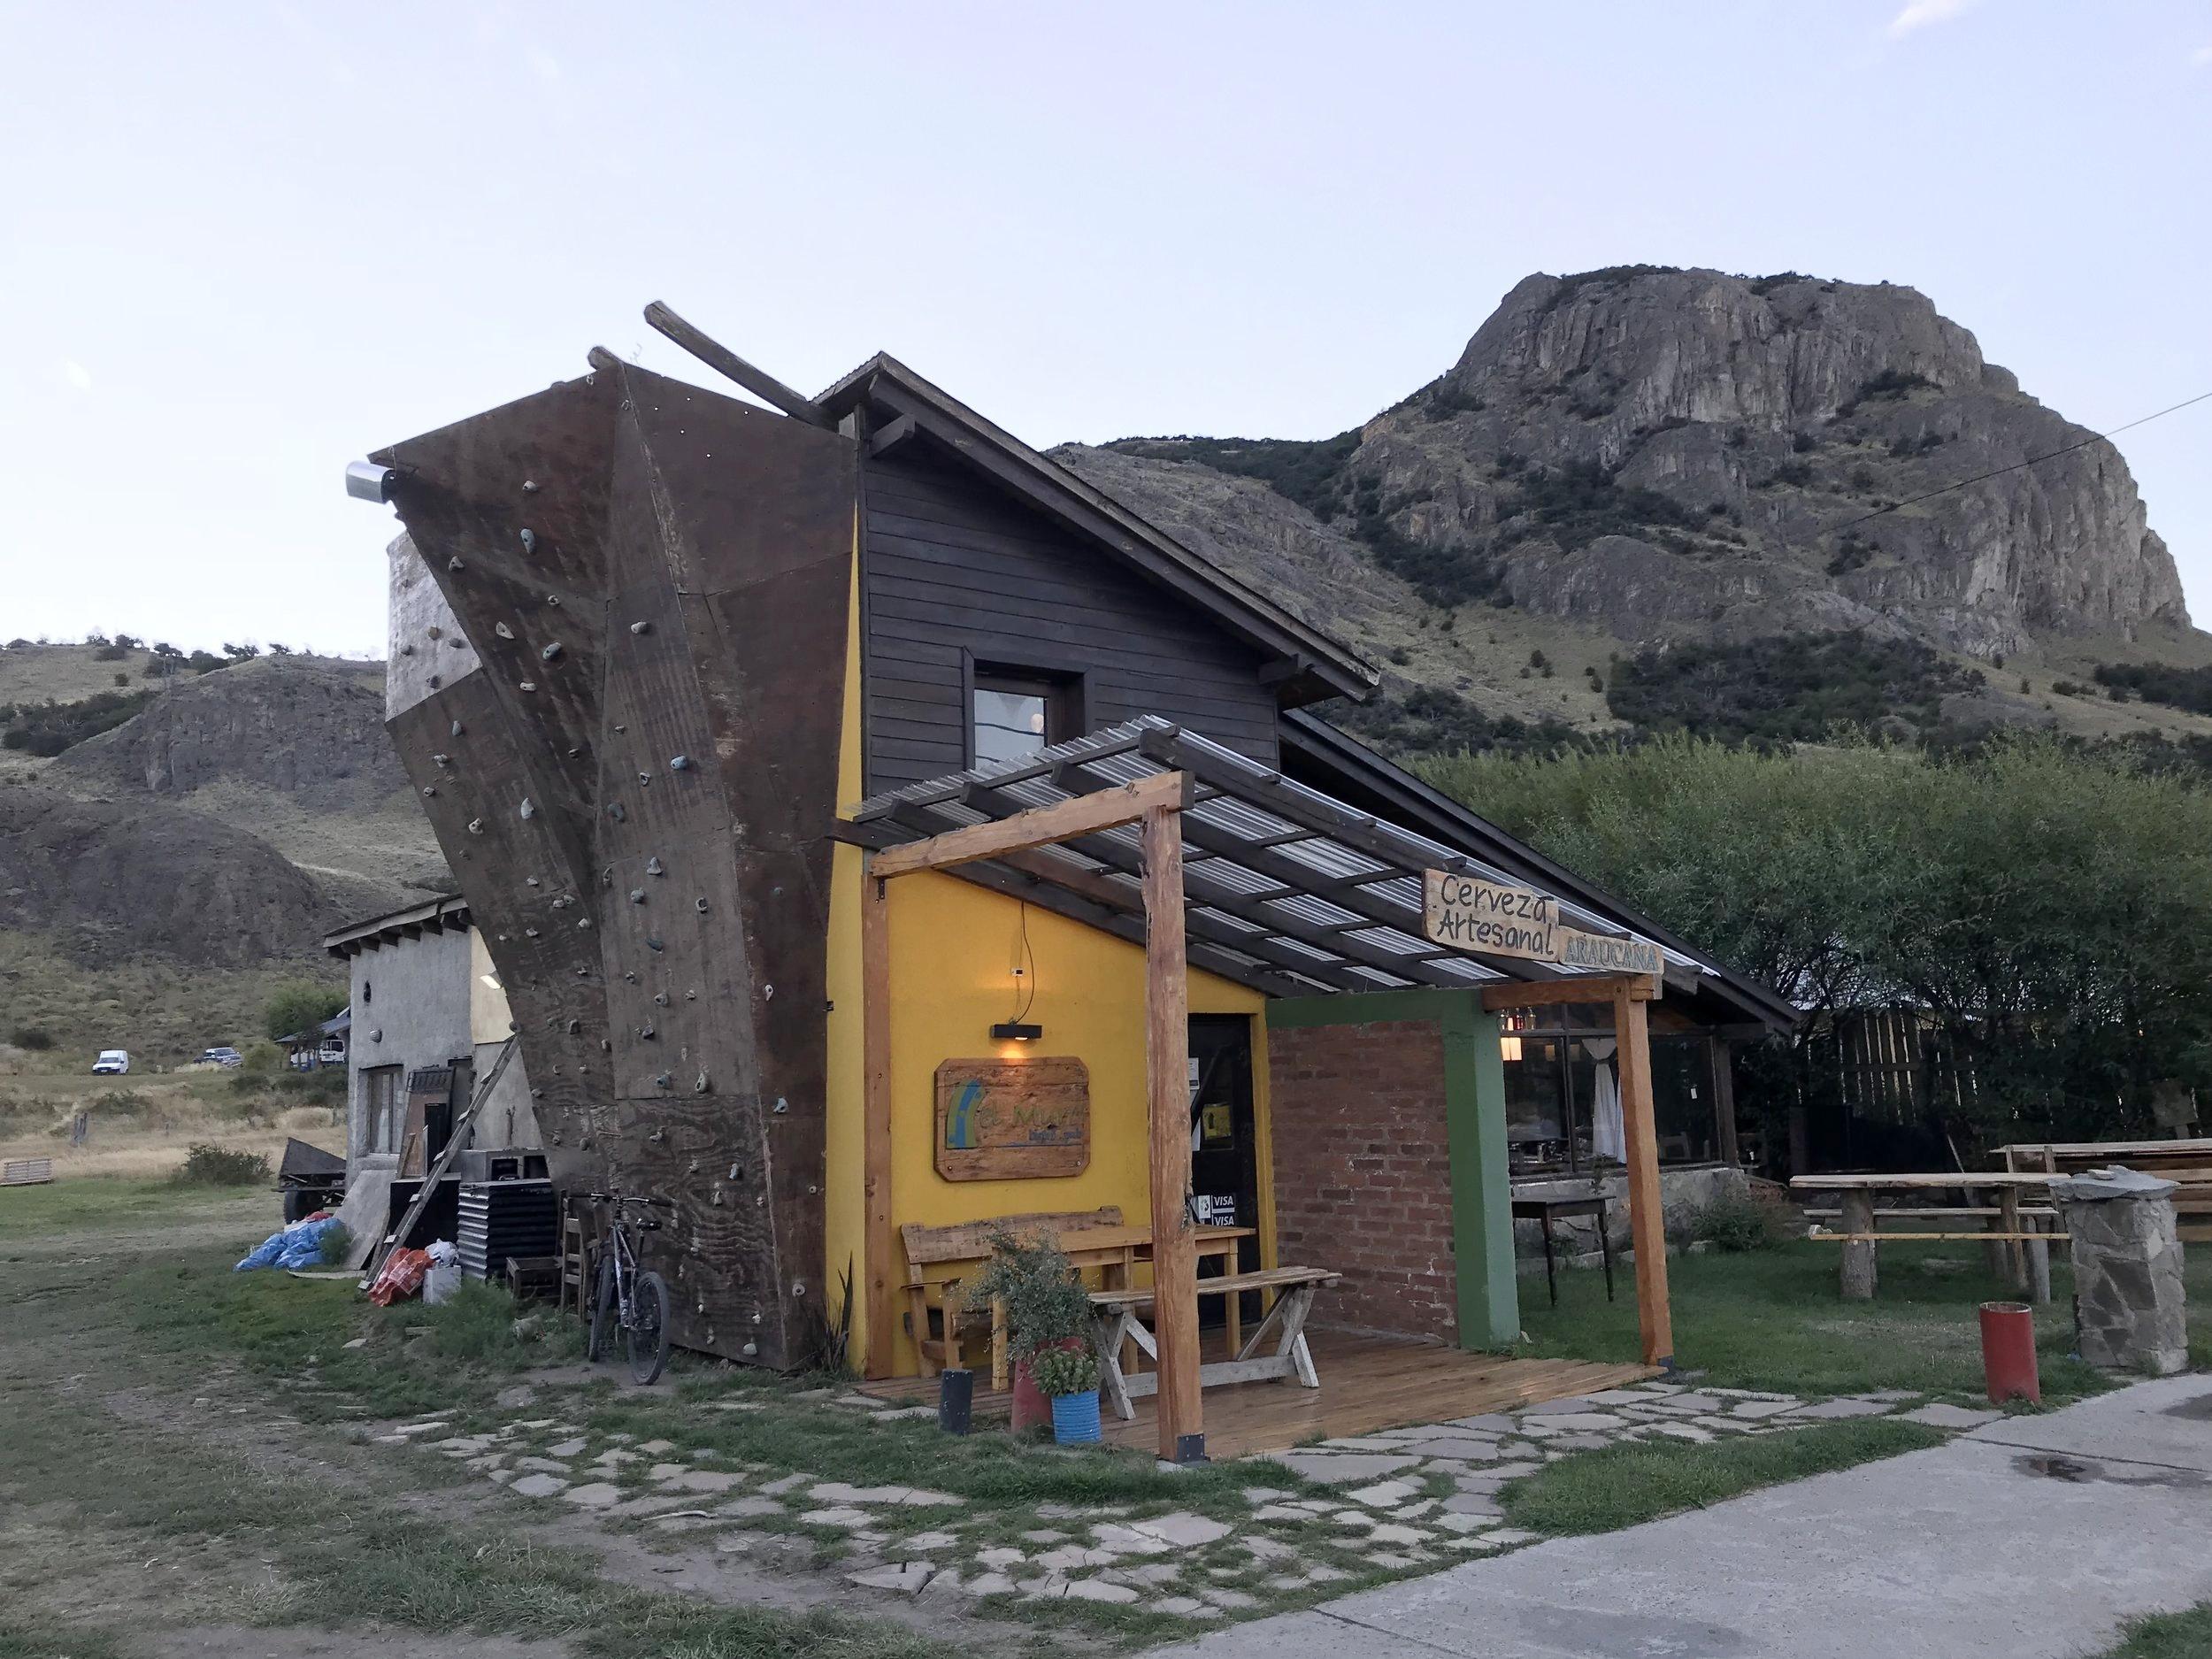 24hourkitchen-travel-argentina-el-chalten-patagonia-restaurants-guide-el-muro